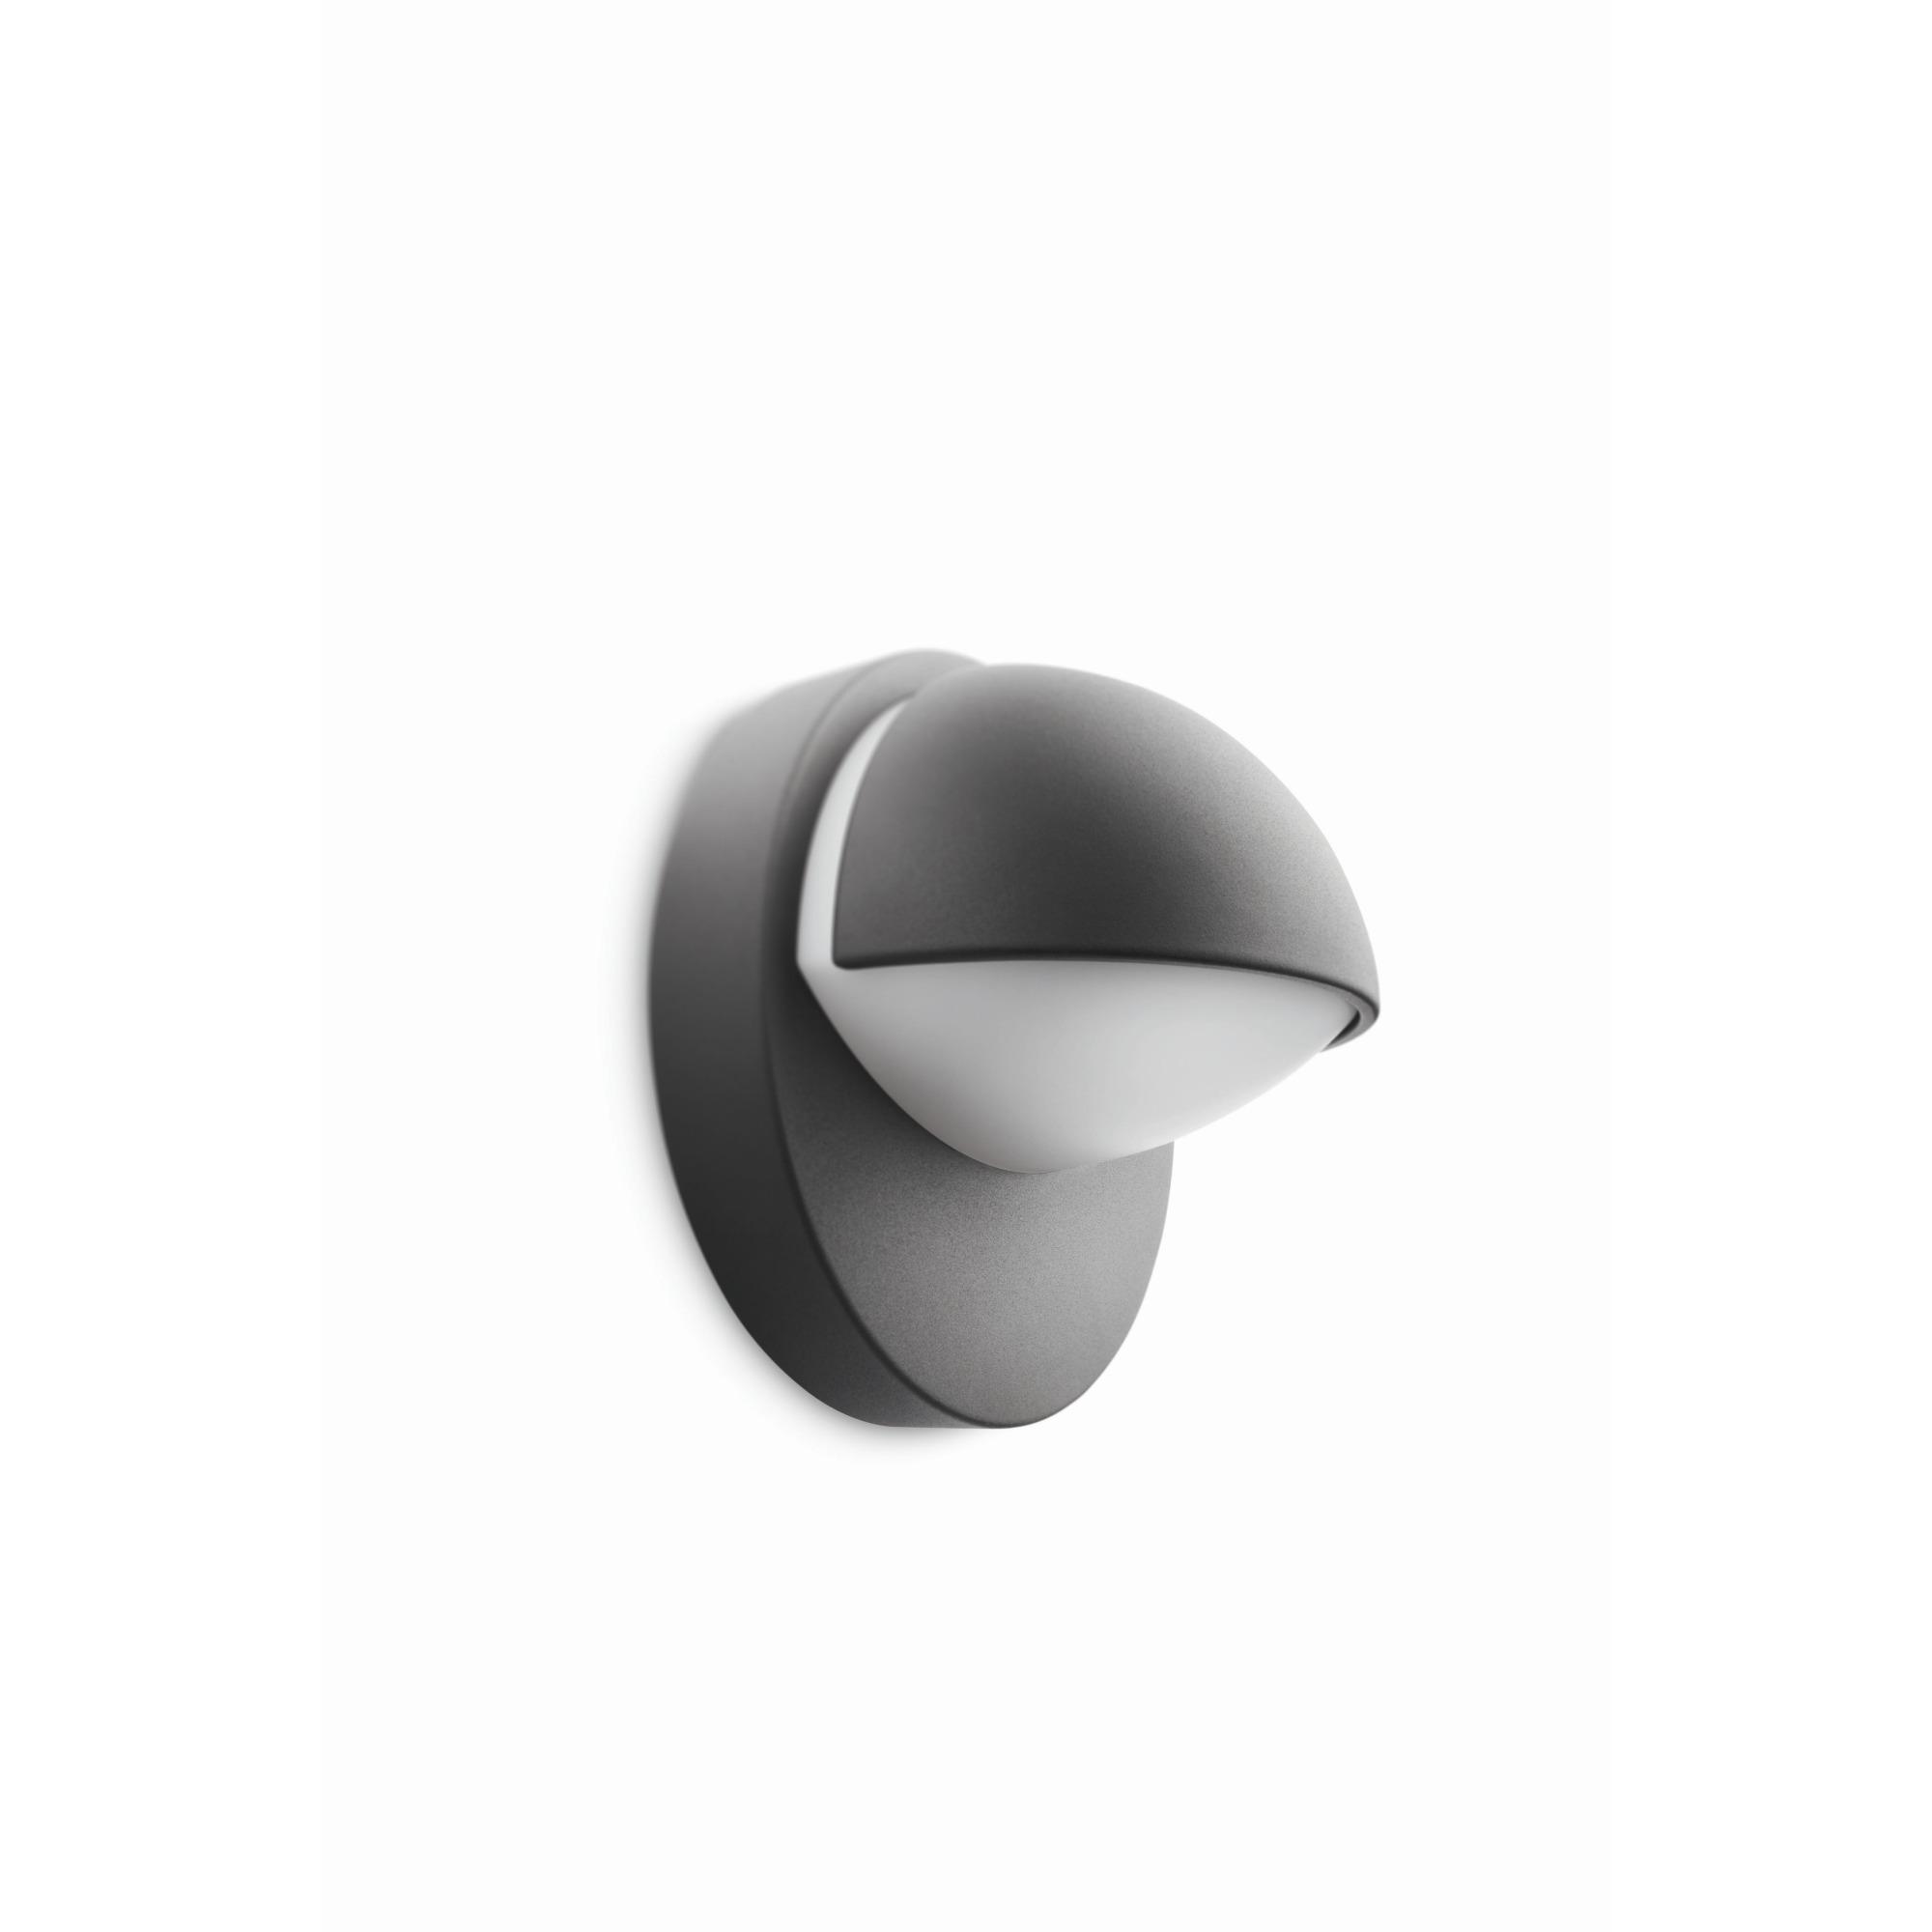 Philips mygarden june wandlamp 230 v 12 w e27 antraciet